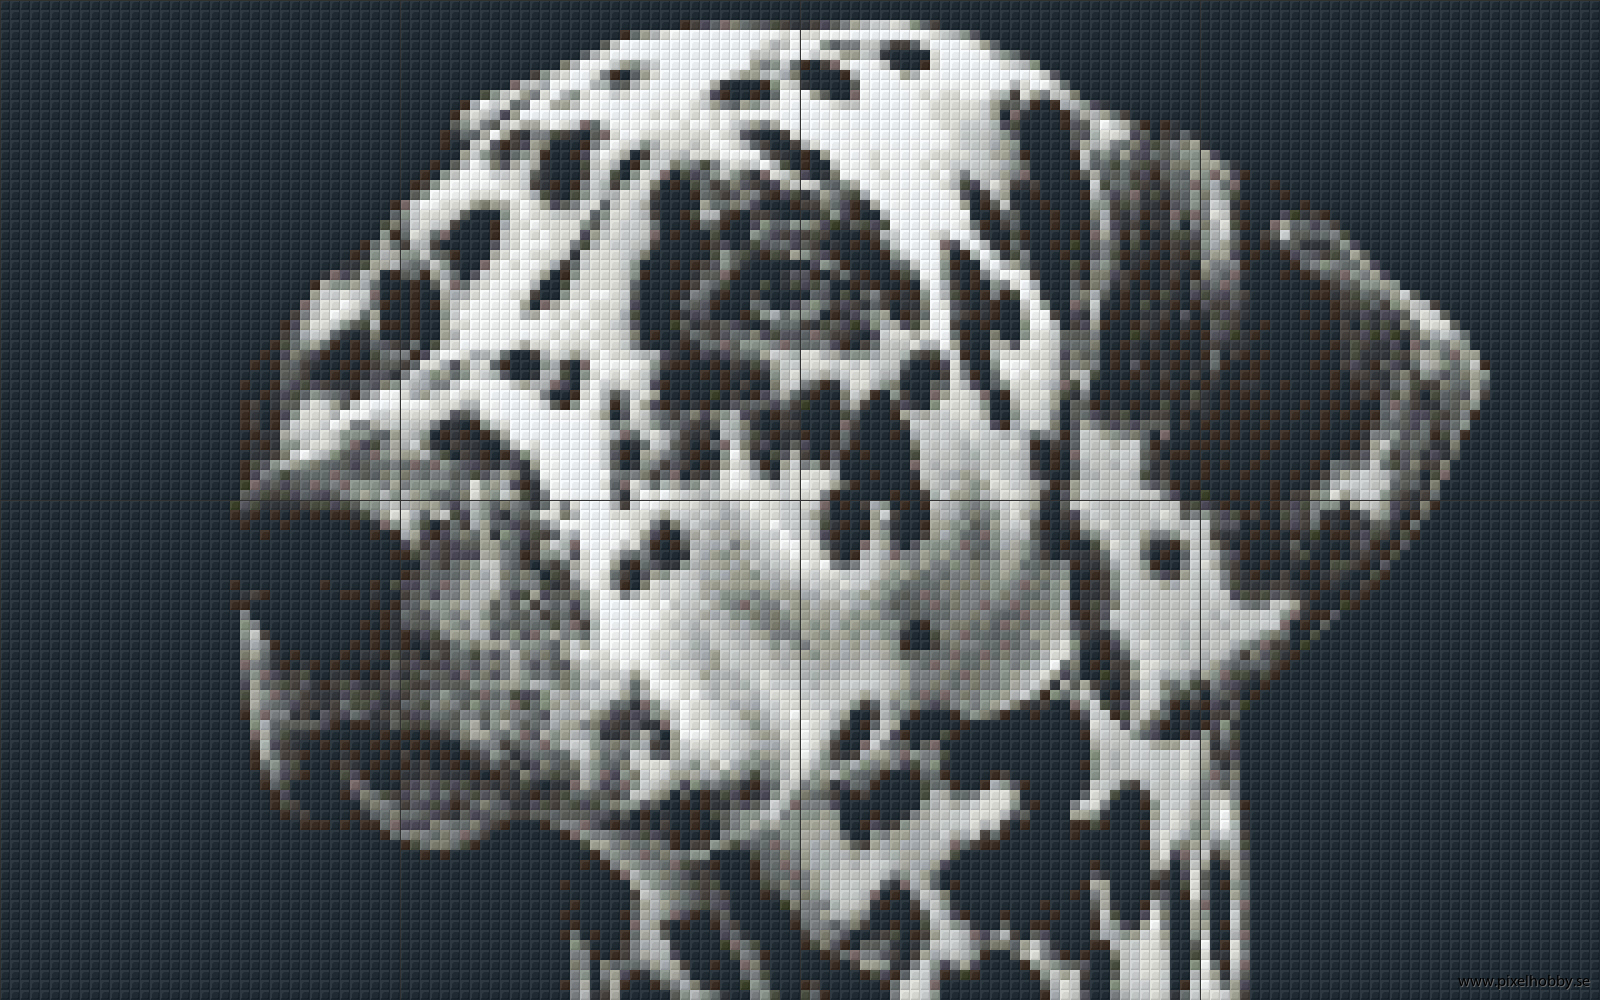 Dalmatiner 8 rbp